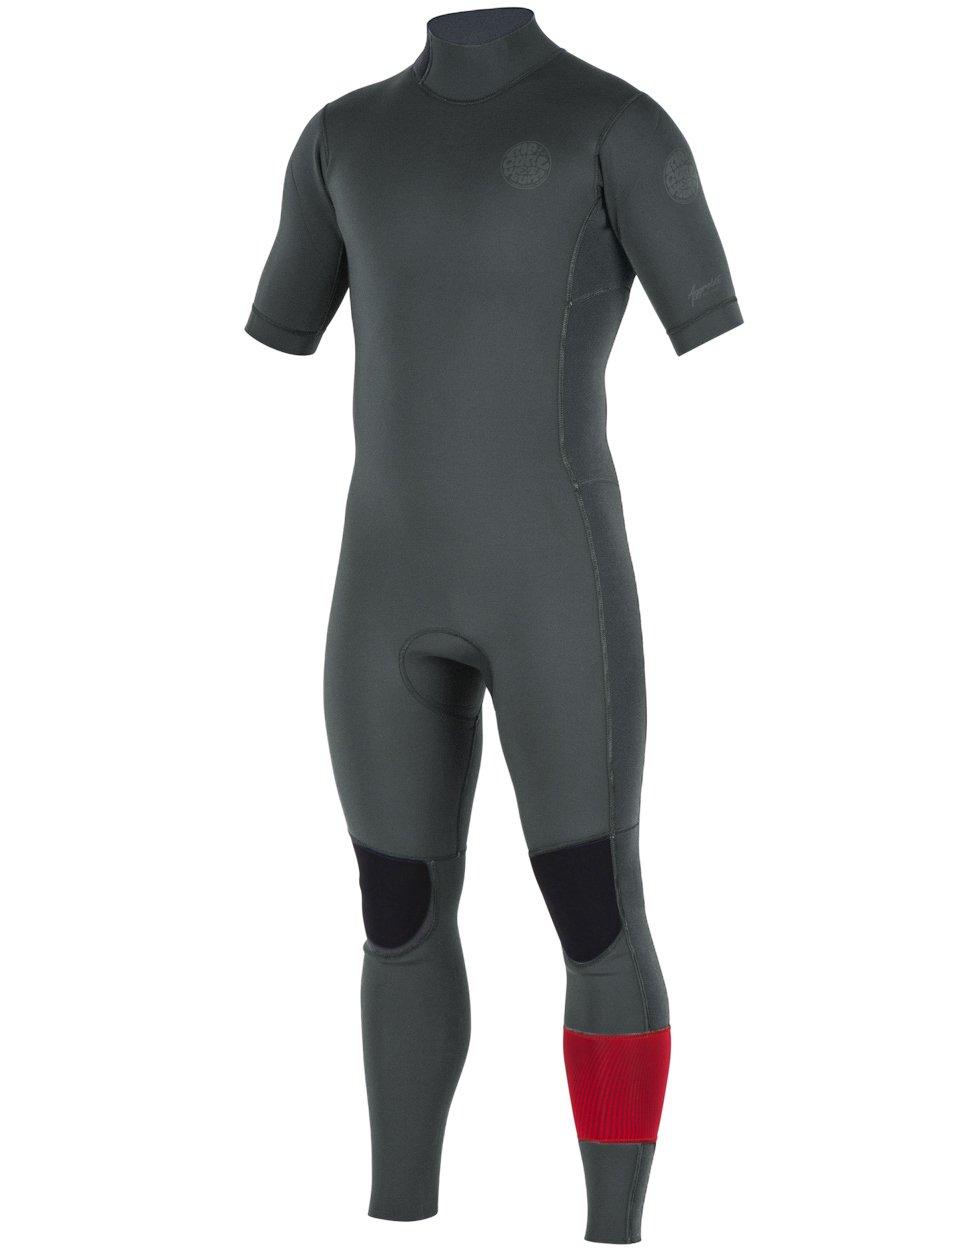 Rip Curl Mens Aggrolite S/S Full Back Zip Wetsuit Charcoal S'19